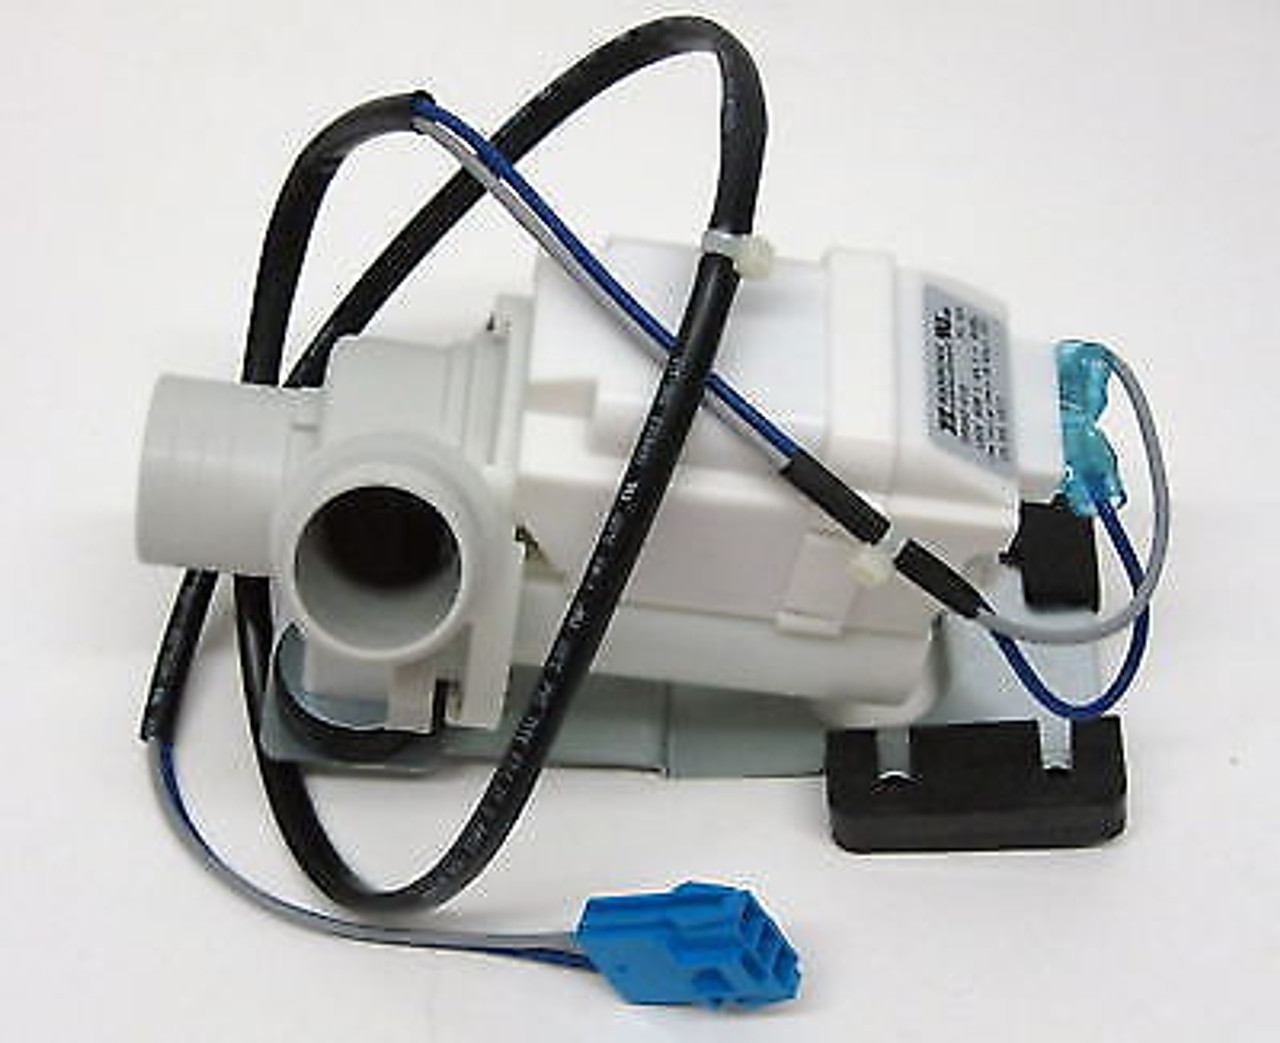 GE Washing Machine Pump   McCombs Supply Co   WH23X10020   Ge Washing Machine Pump Wiring      McCombs Supply